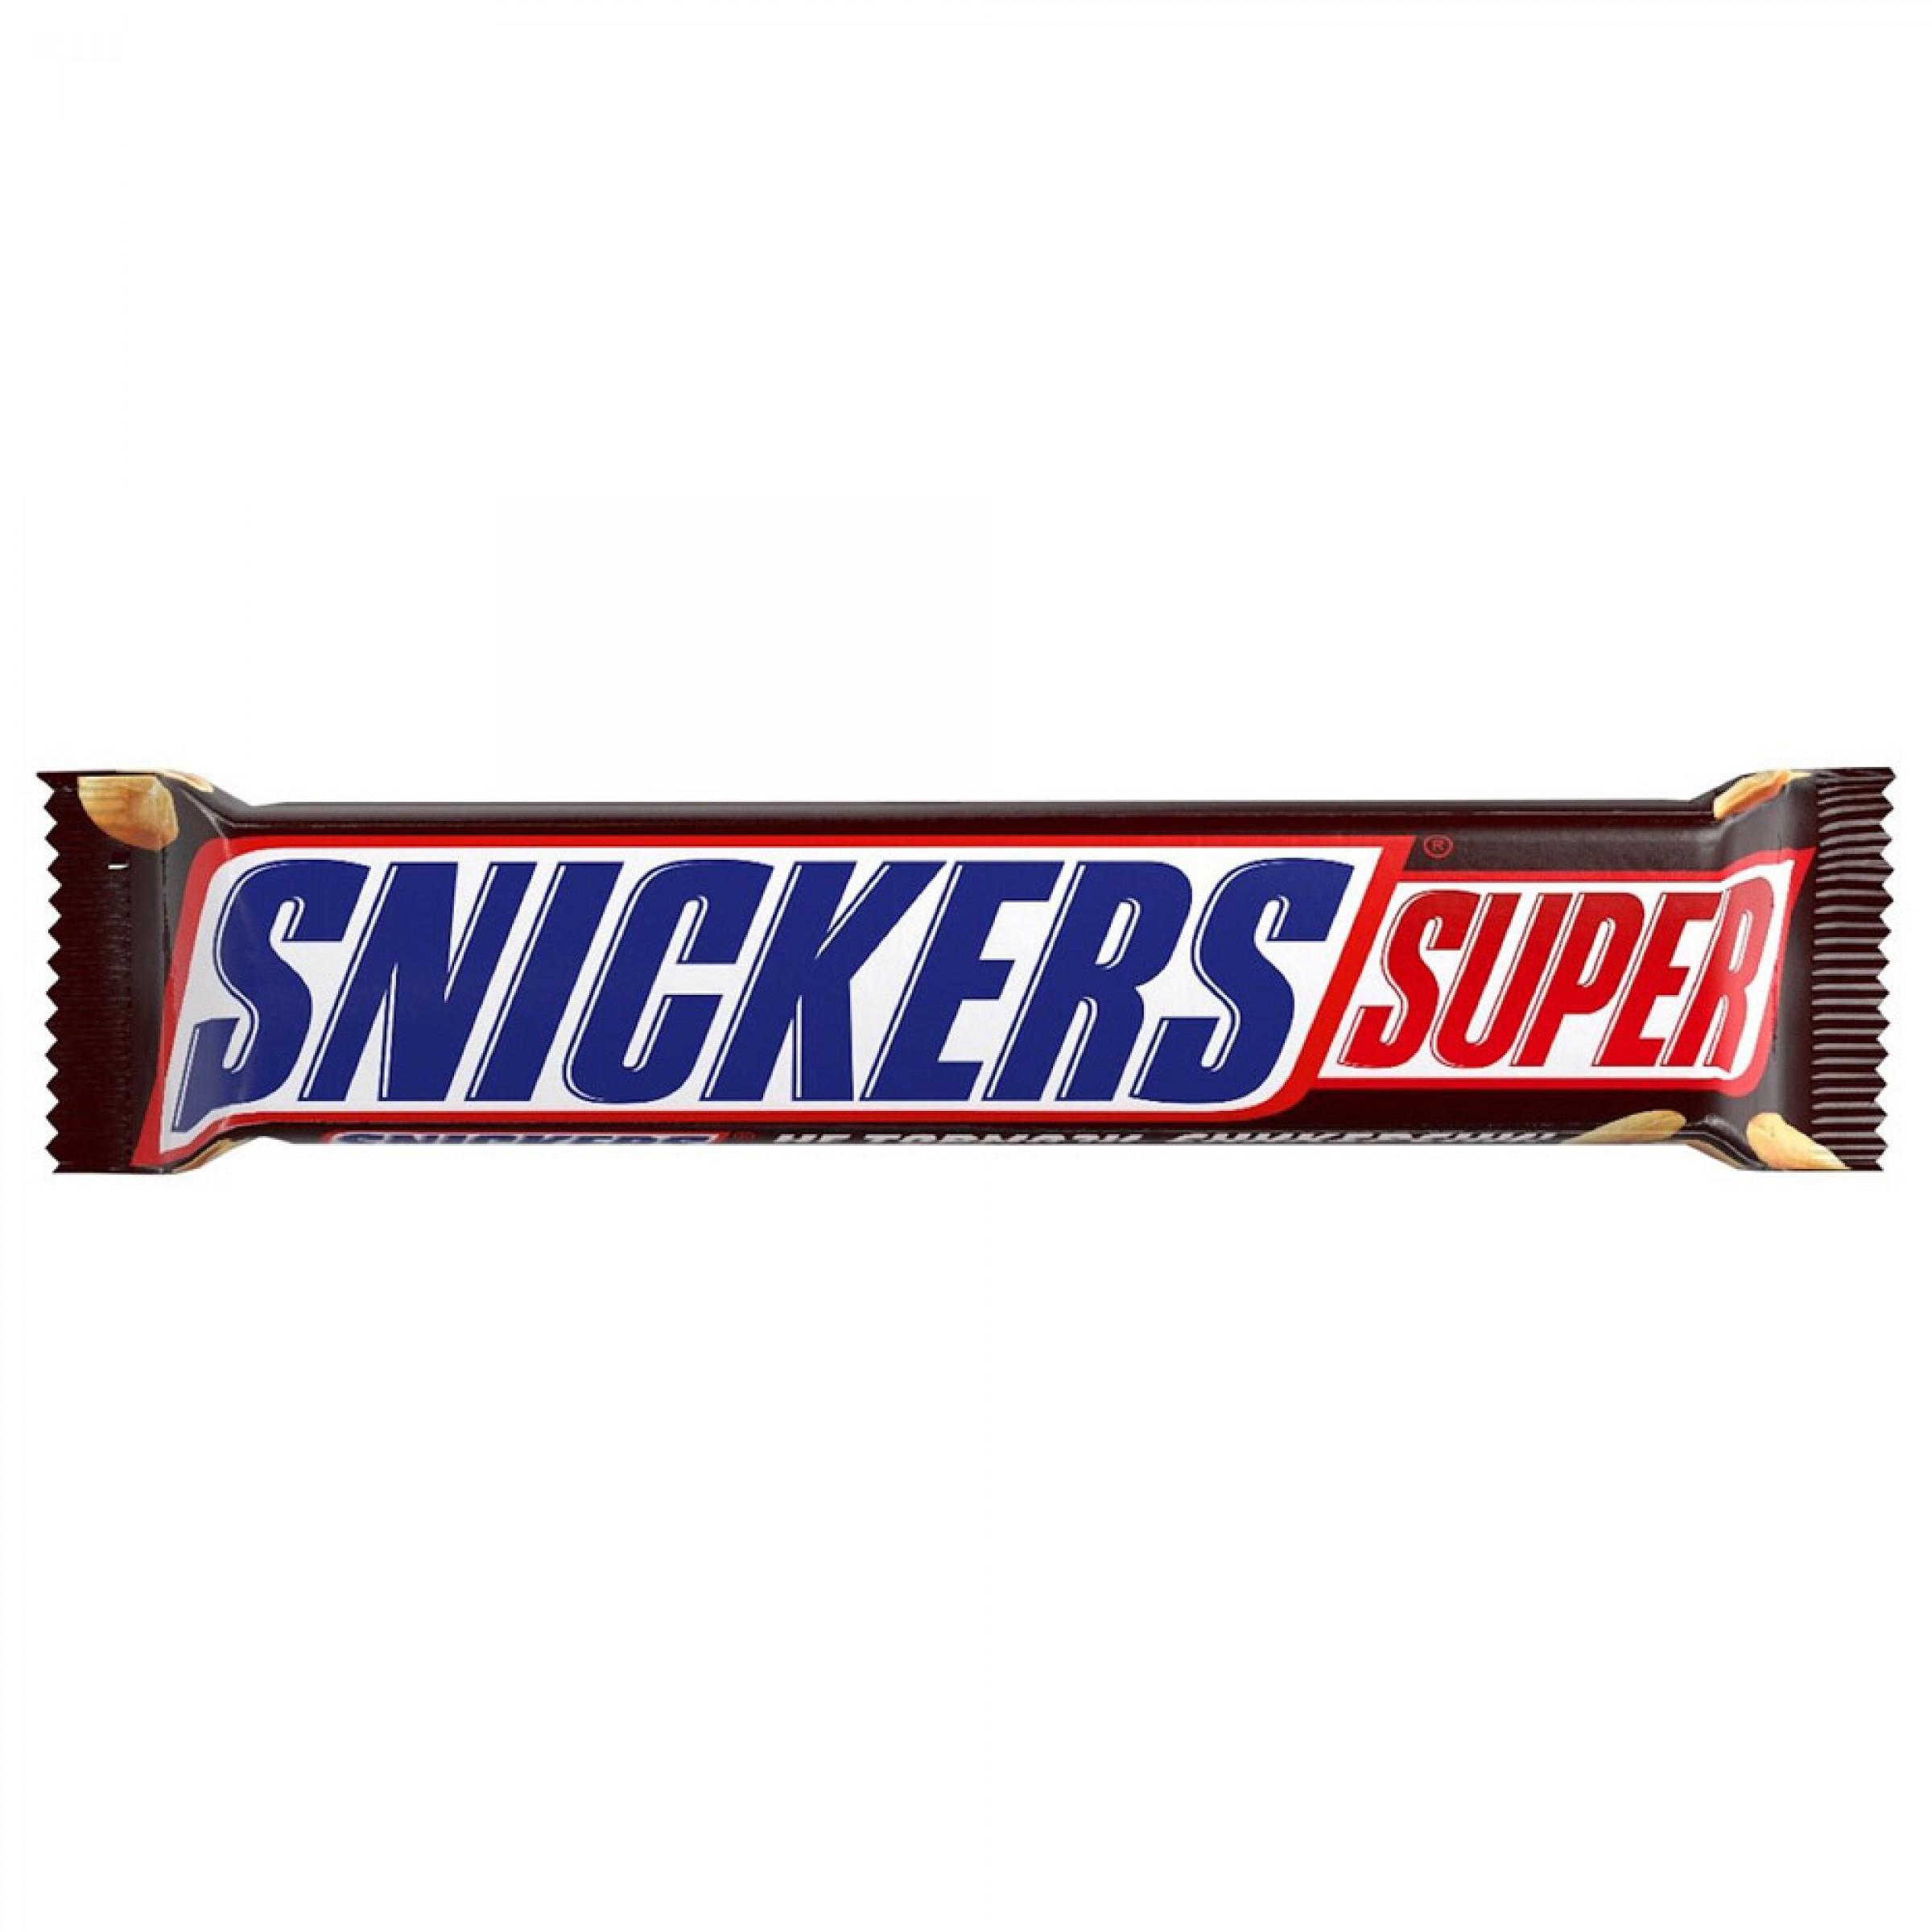 Шоколадный батончик Snickers Super, 95гр